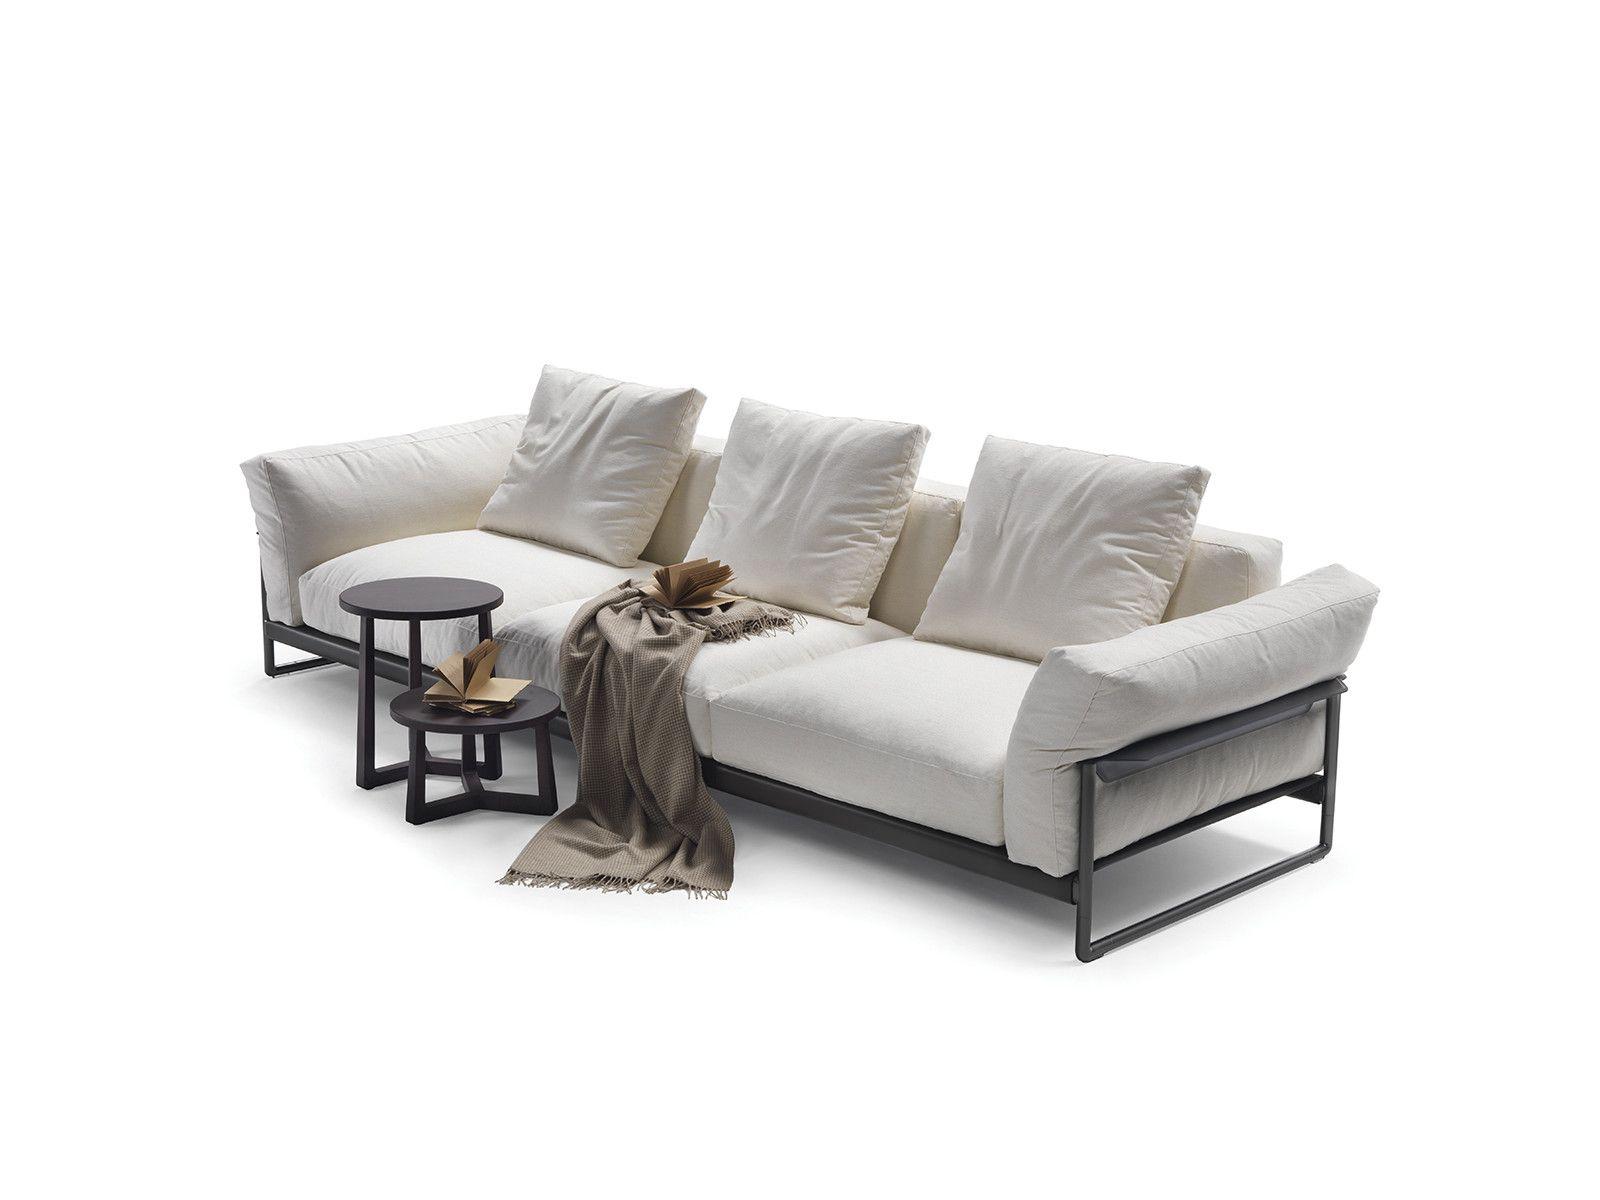 Zeno Light Flexform 2016 Modern Luxury Furniture Made In